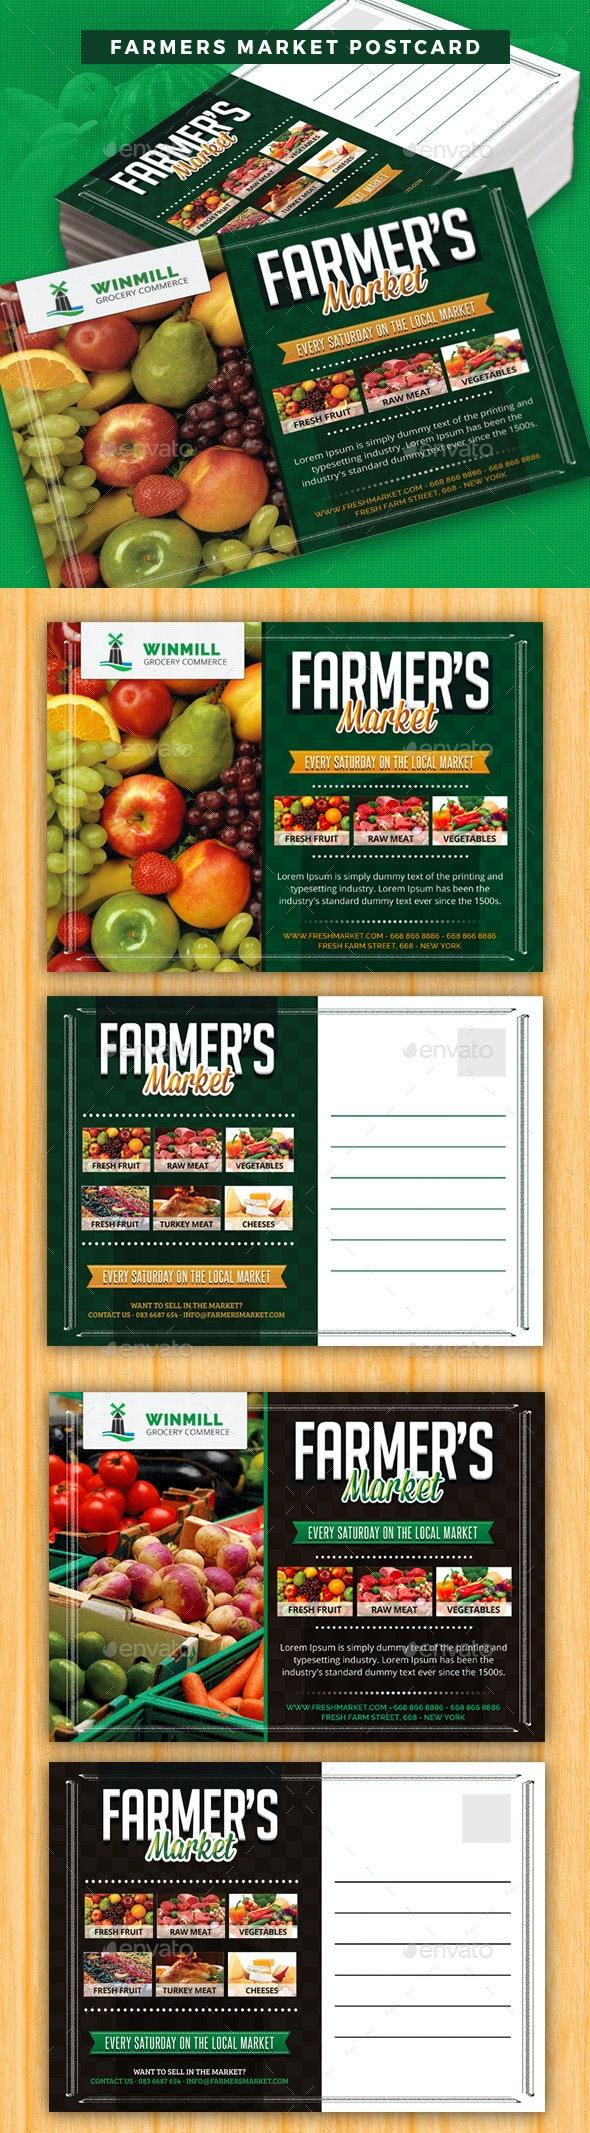 Farmers Market Postcard Template - Cards & Invites Print Templates